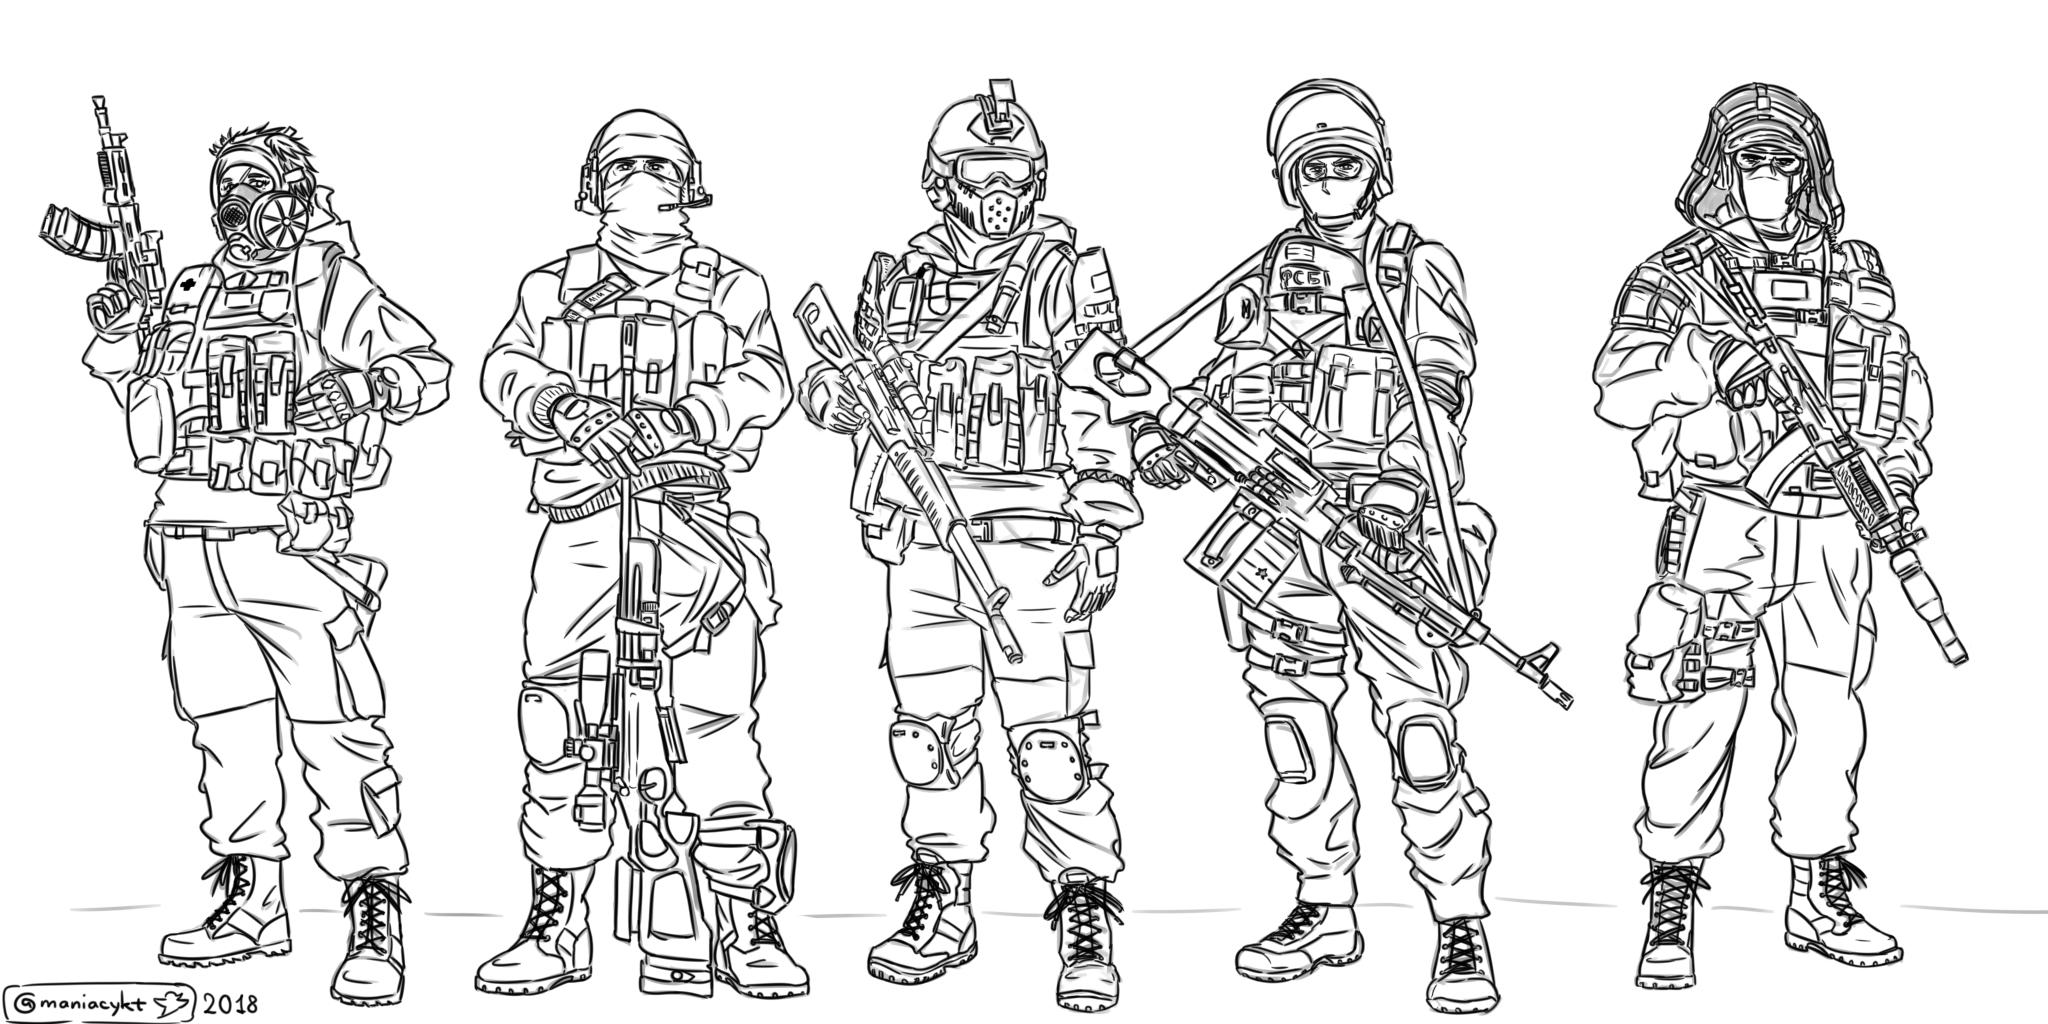 https://orig00.deviantart.net/34fc/f/2018/220/3/7/battlesiege_by_maniac_kagesenshi-dcjlw6t.jpg